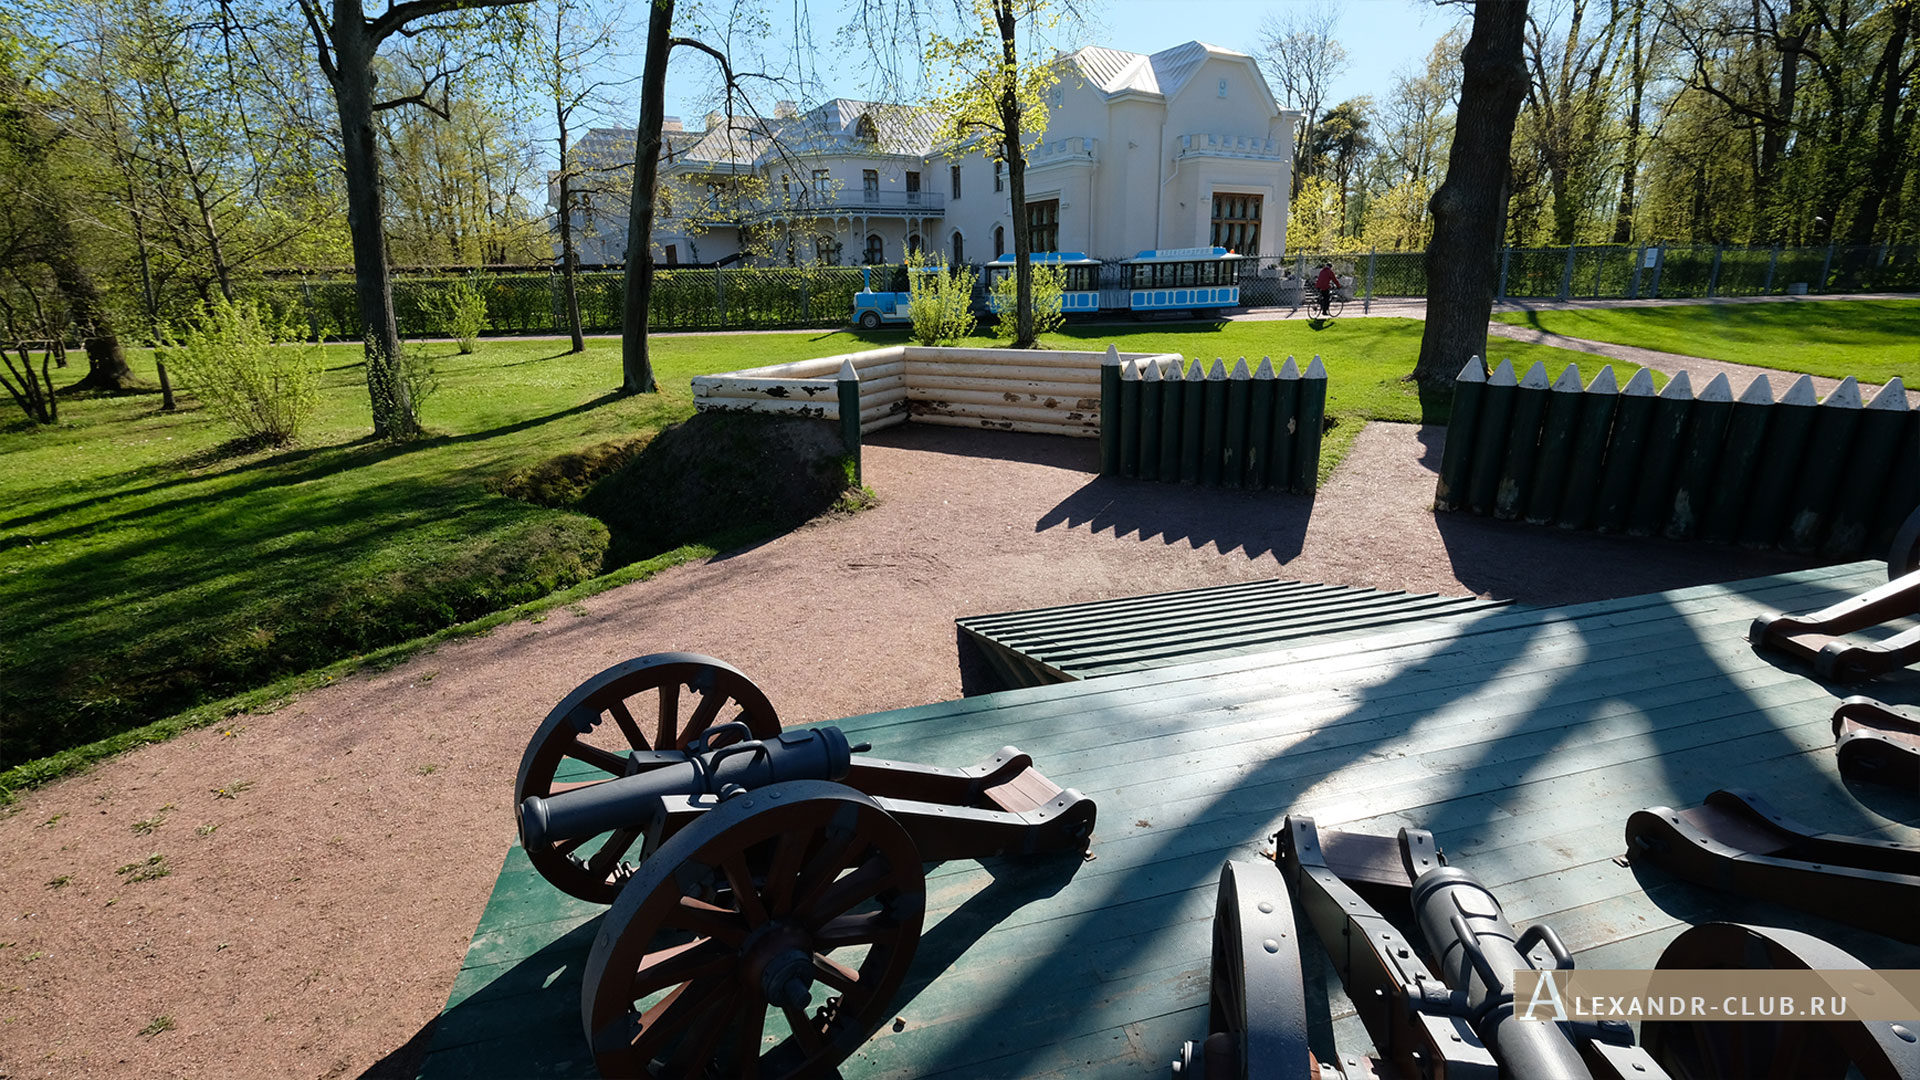 Петергоф, парк «Александрия», весна, редут, пушки, Фермерский дворец